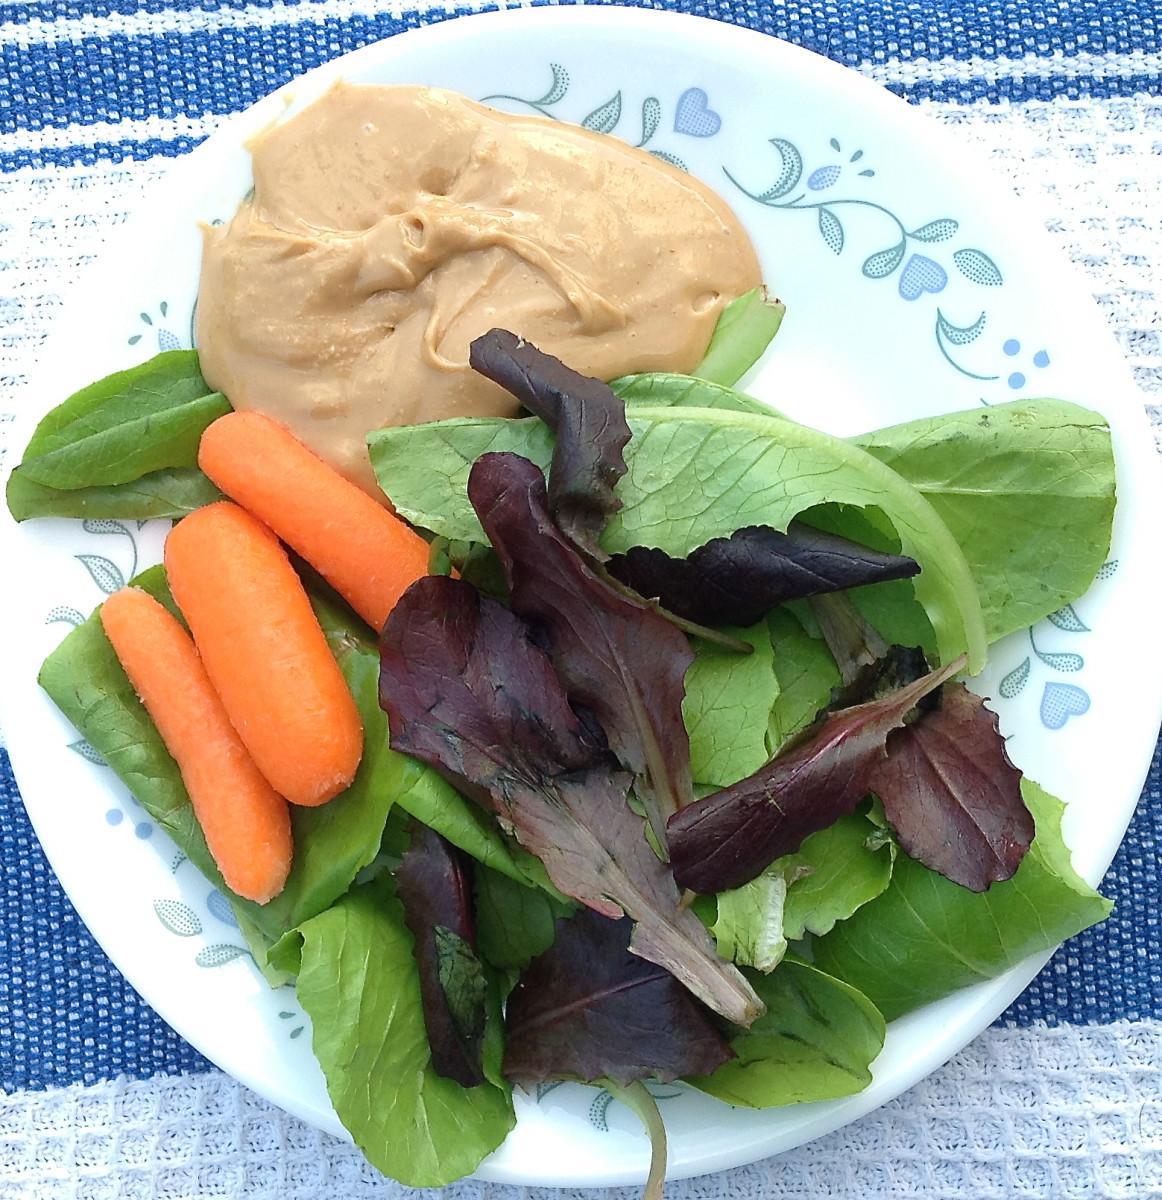 Dark salad greens, carrots and cashew butter